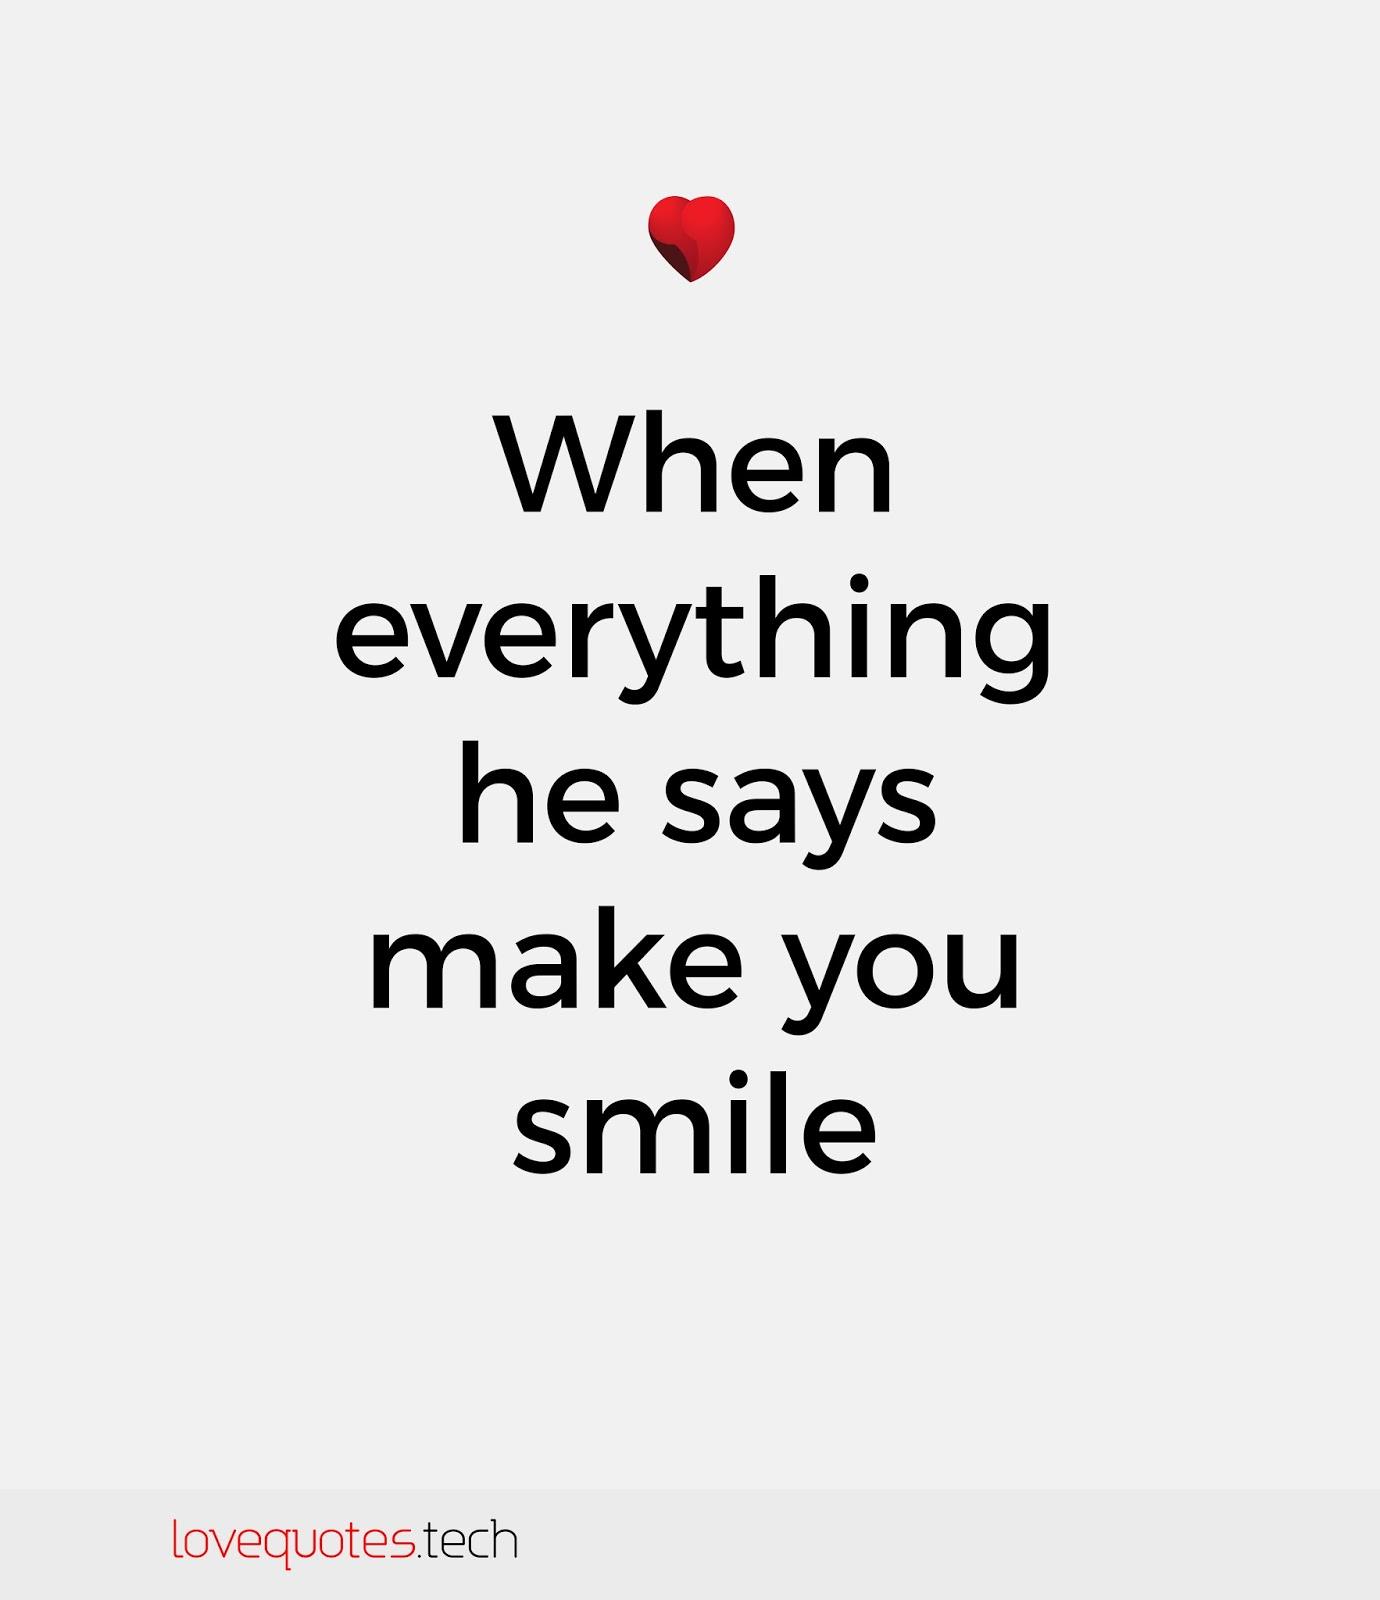 Smile poems and quotes - Smile Poems And Quotes 45